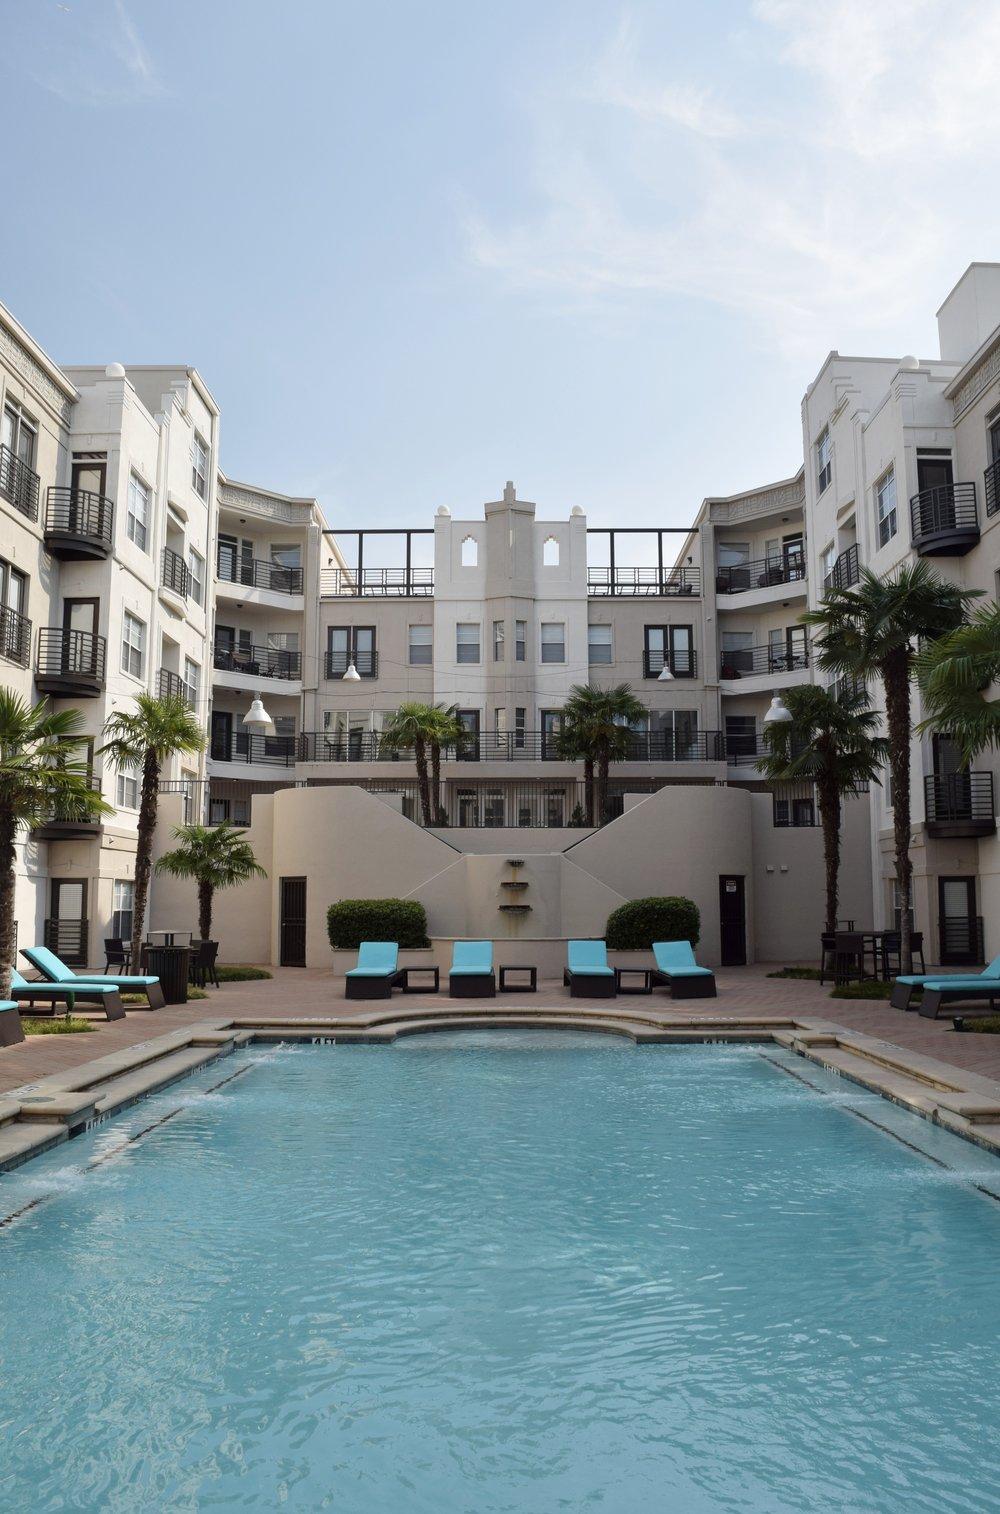 dallas-airbnb-pool-length.jpg